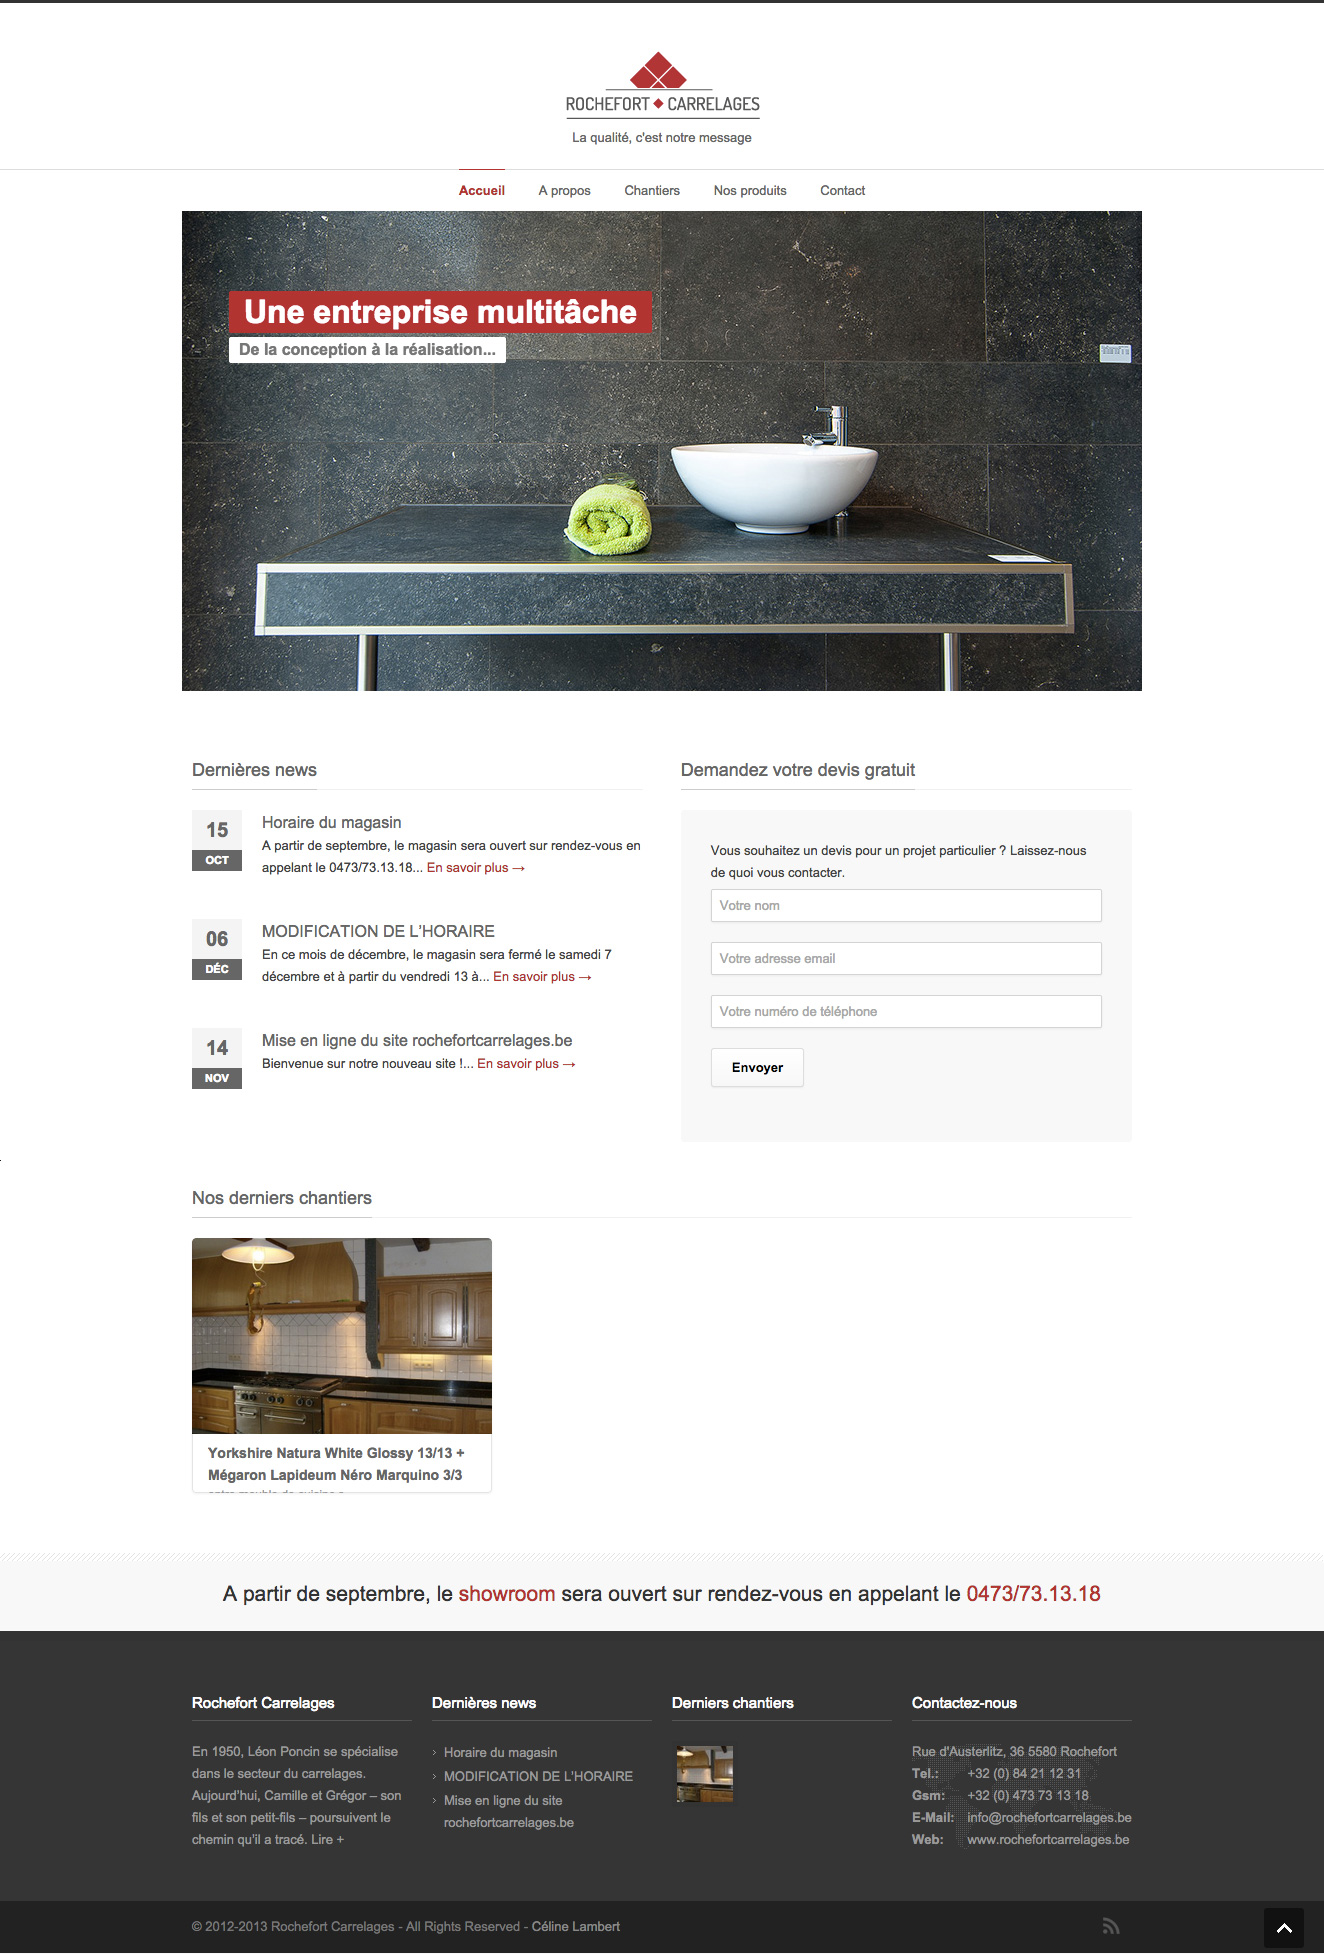 Page d'accueil Rochefort carrelages